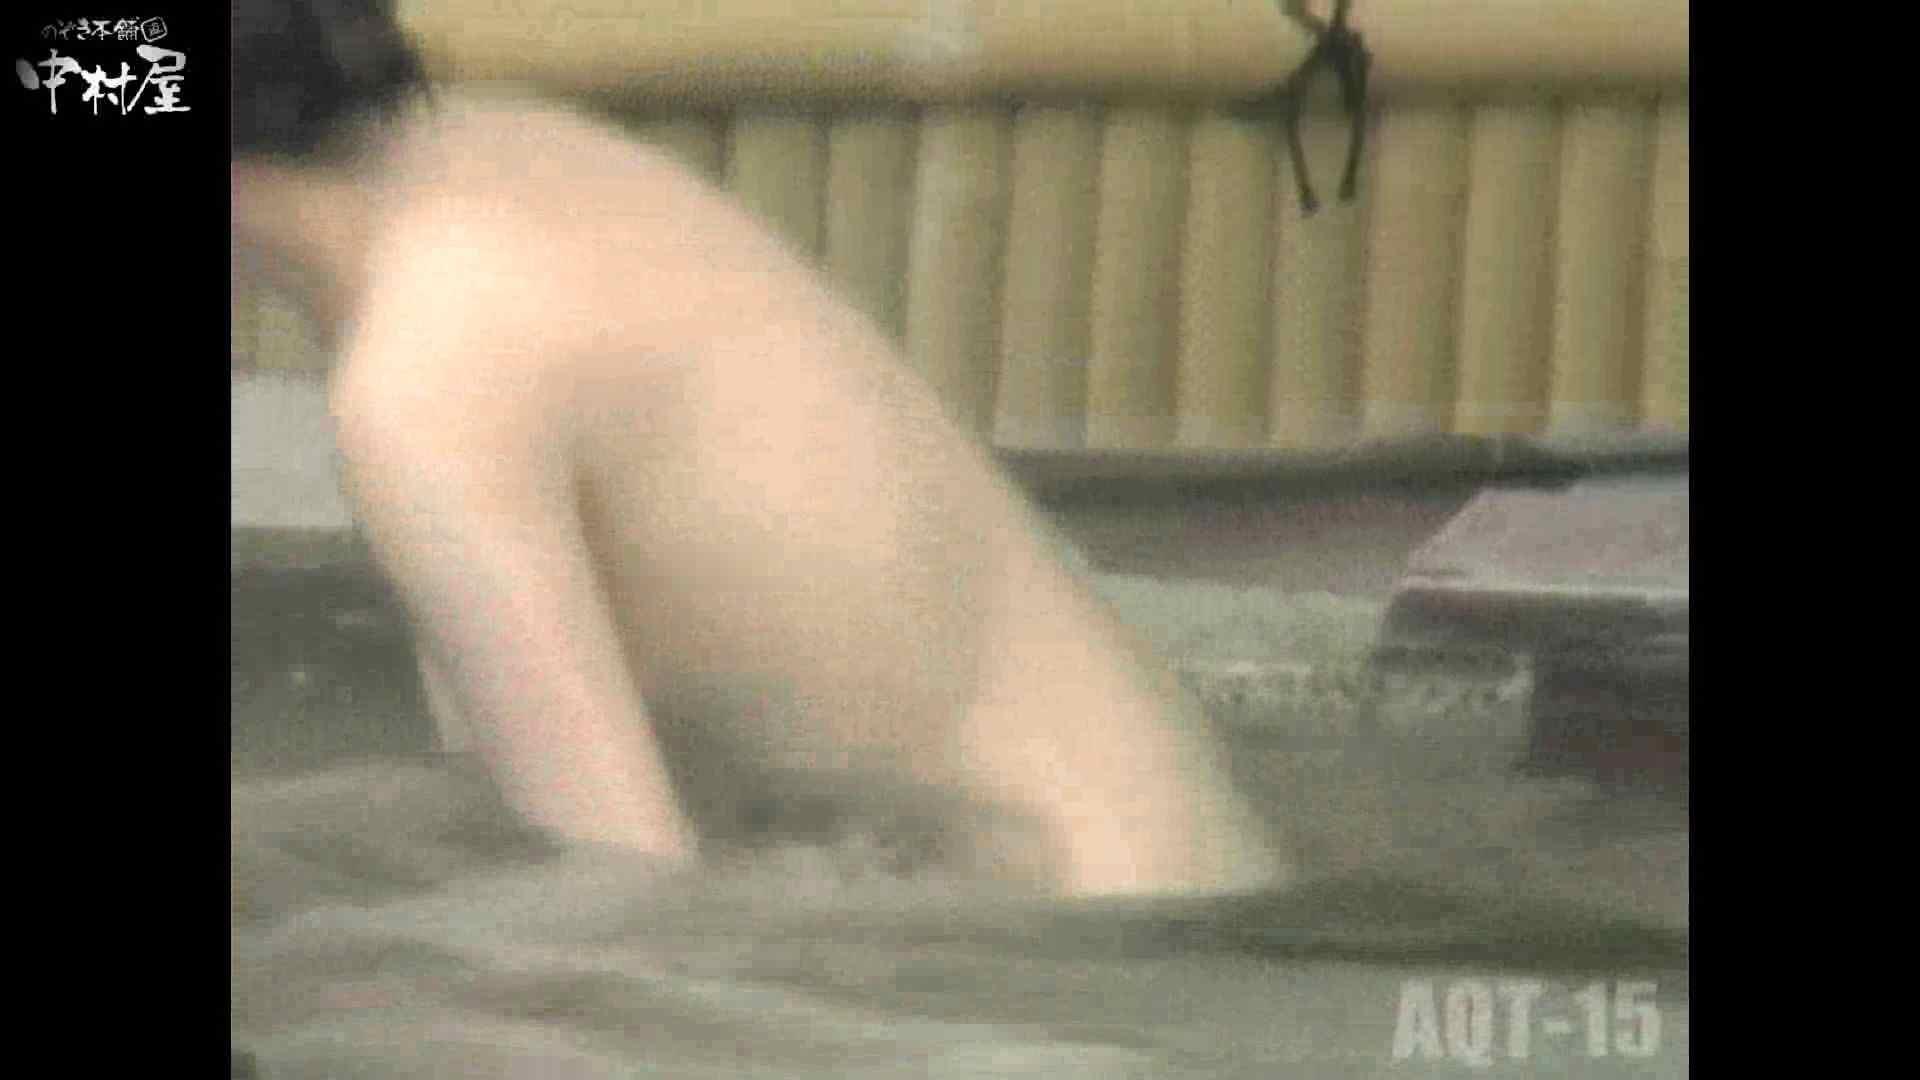 Aquaな露天風呂Vol.878潜入盗撮露天風呂十五判湯 其の三 潜入シリーズ   露天  70pic 55